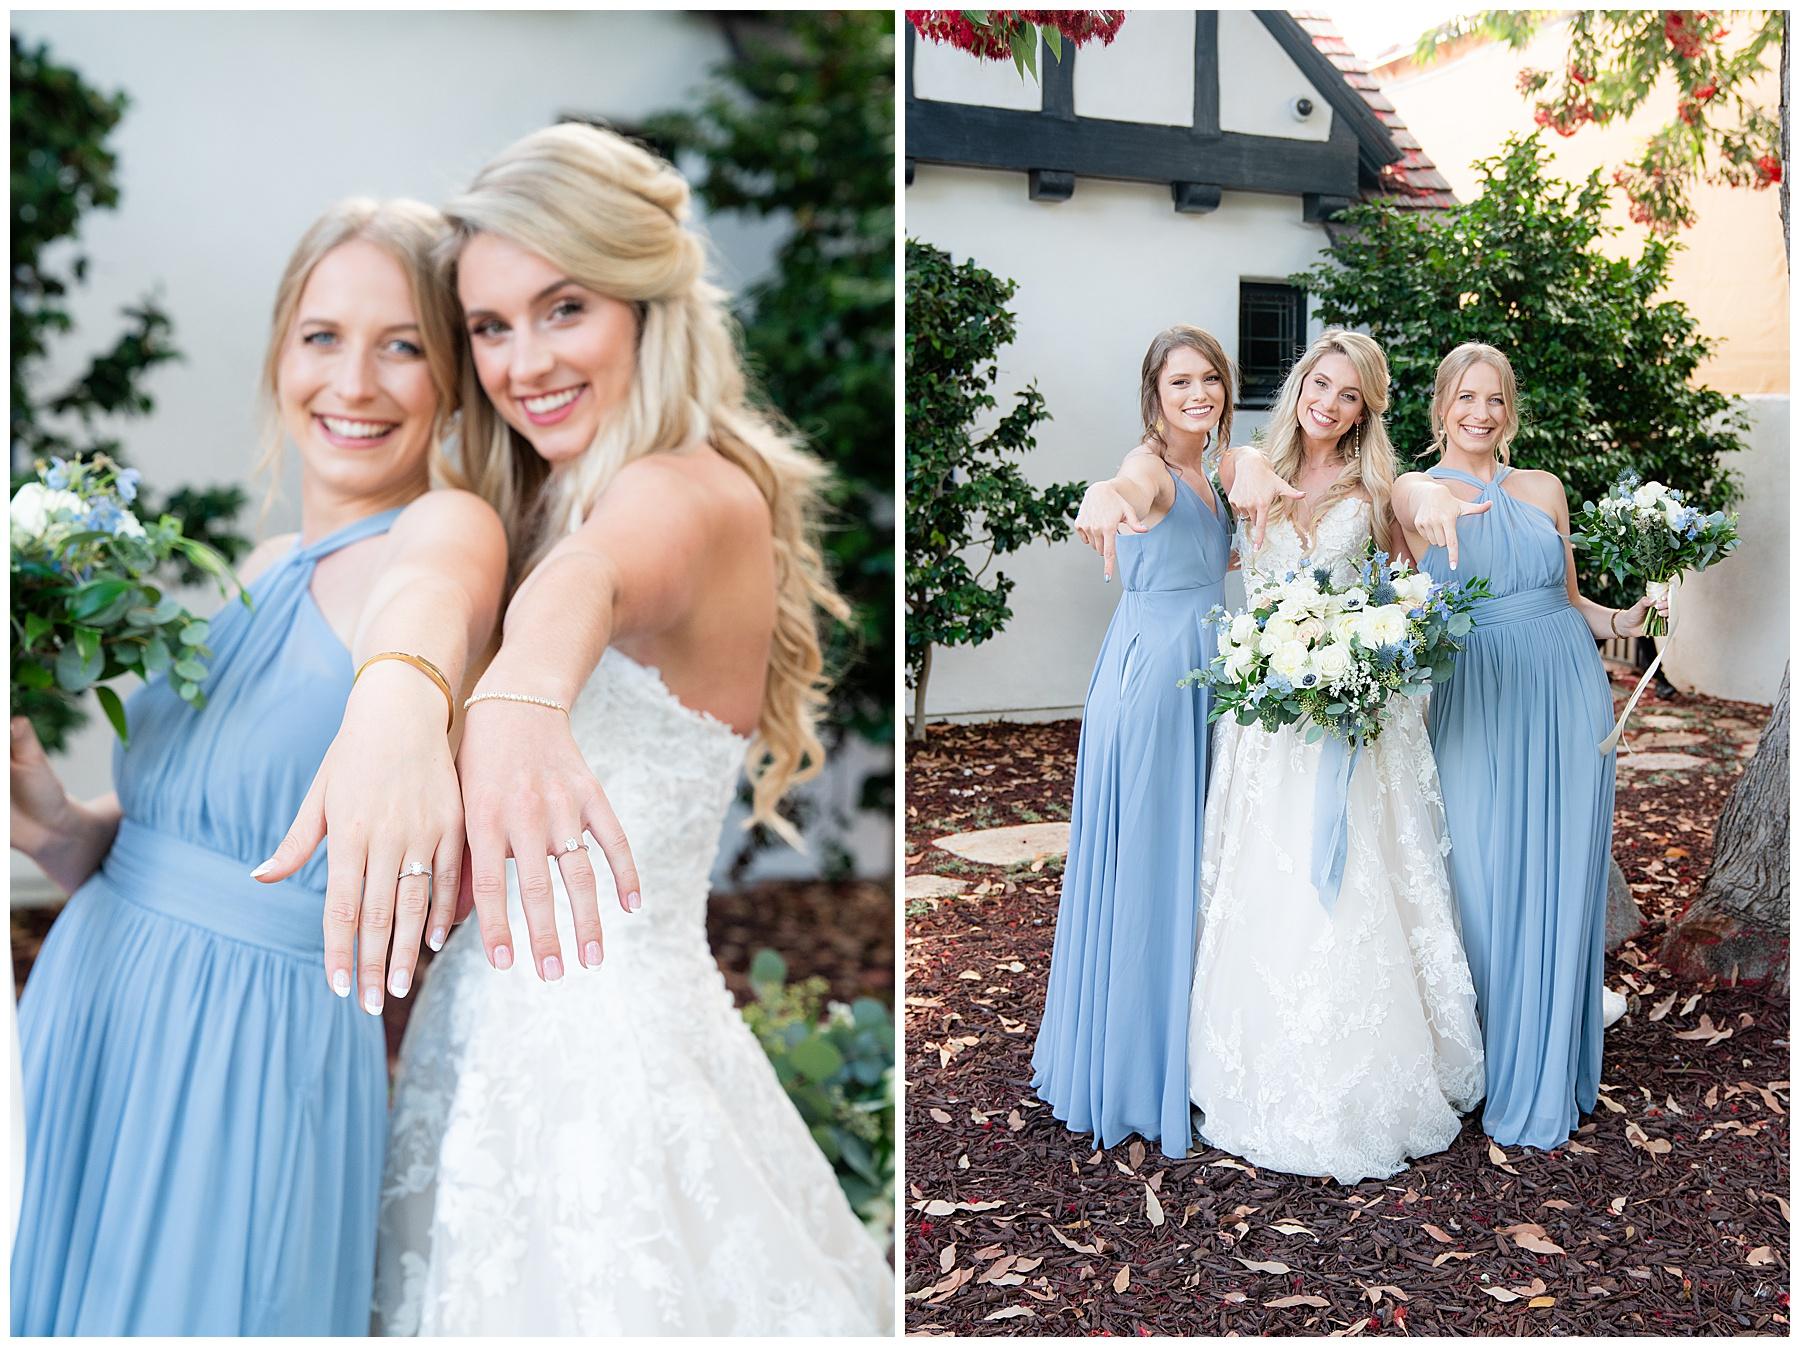 bridesmaids in sky blue dresses